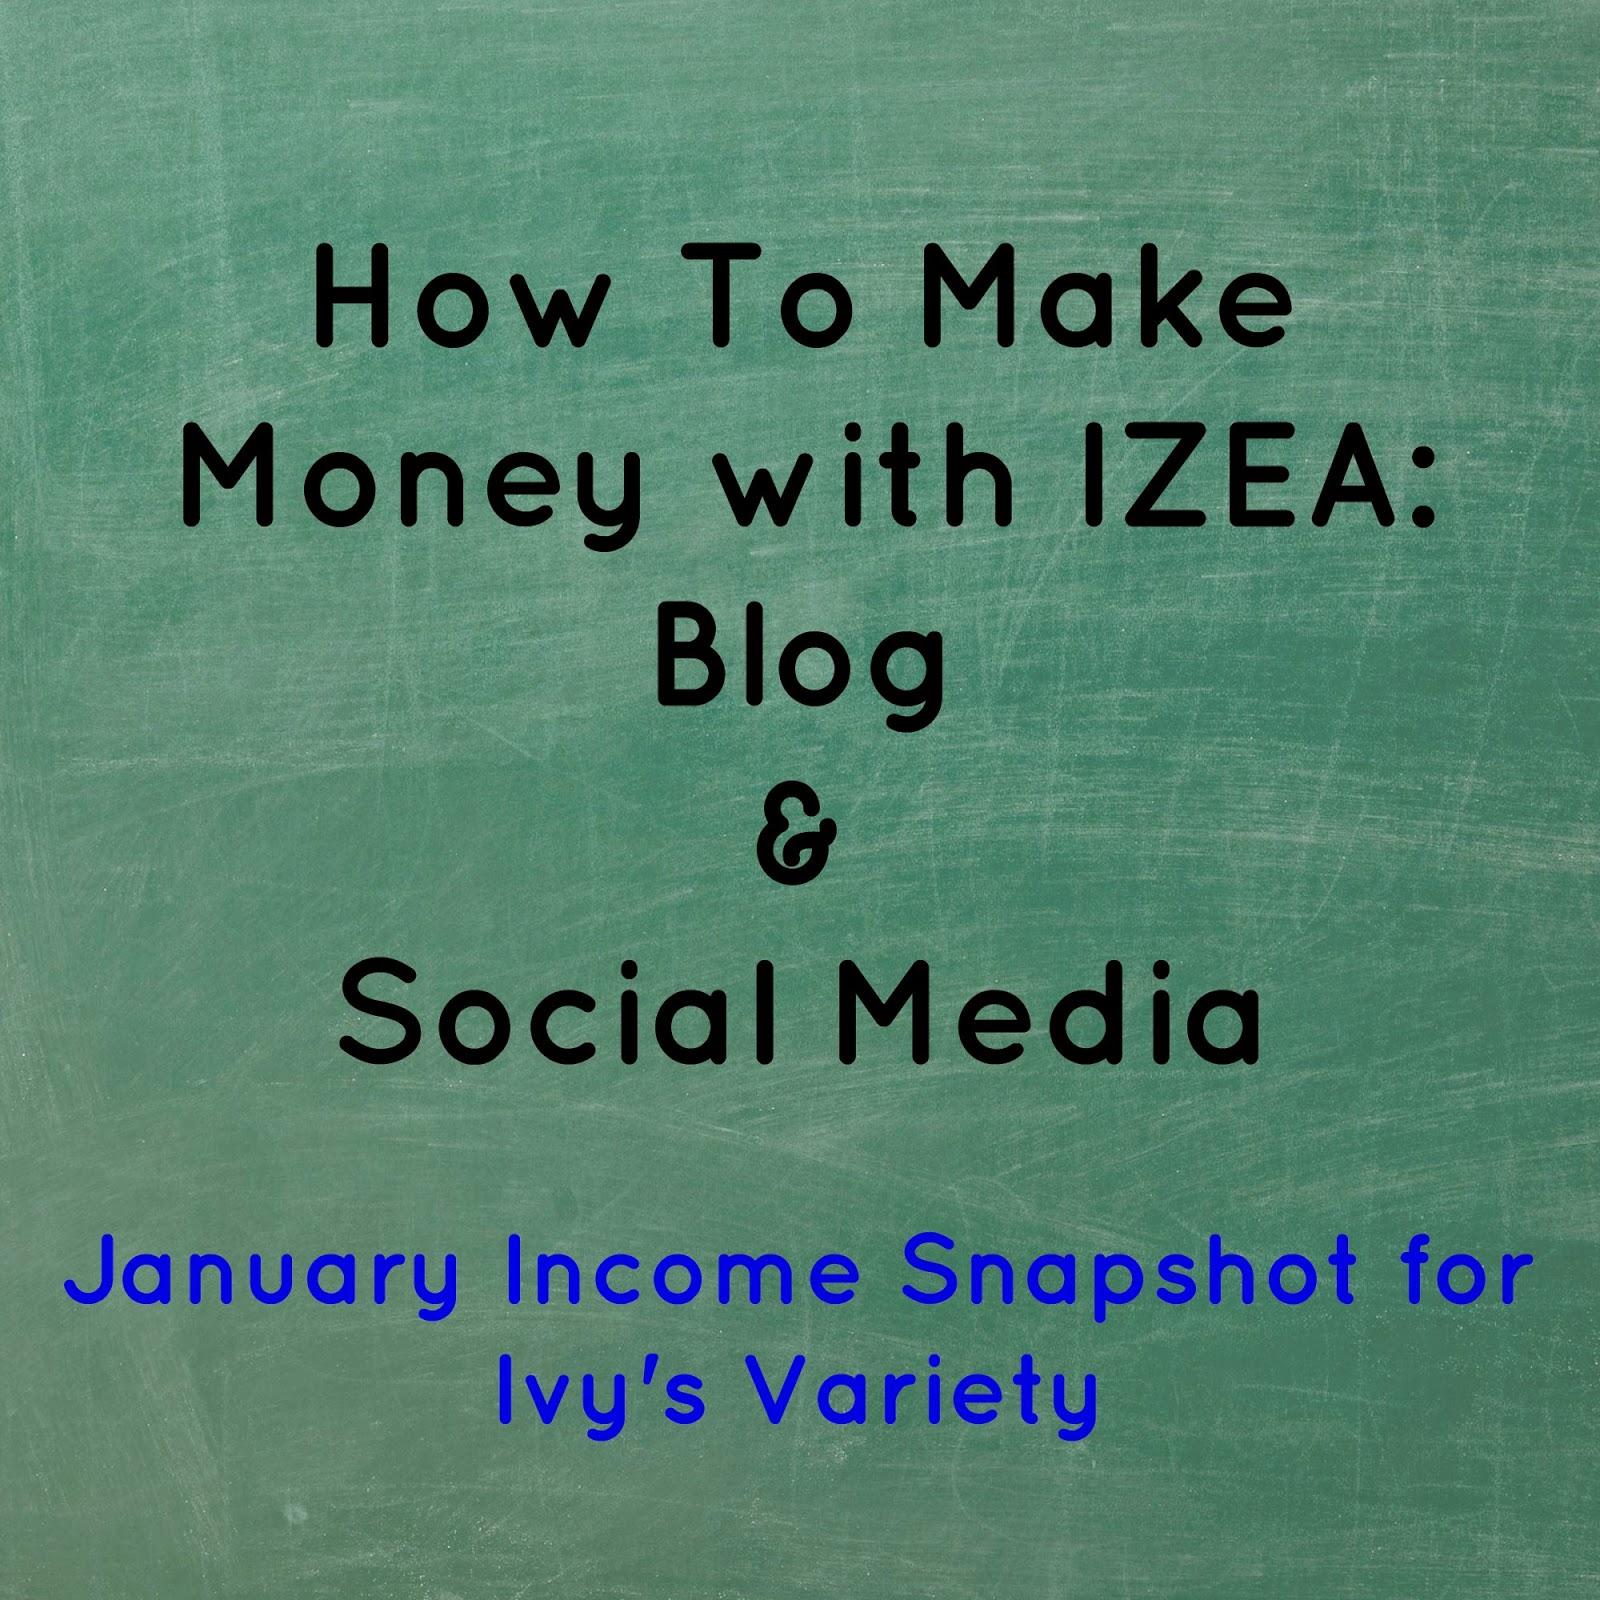 January IZEA income from twitter #ivysvariety